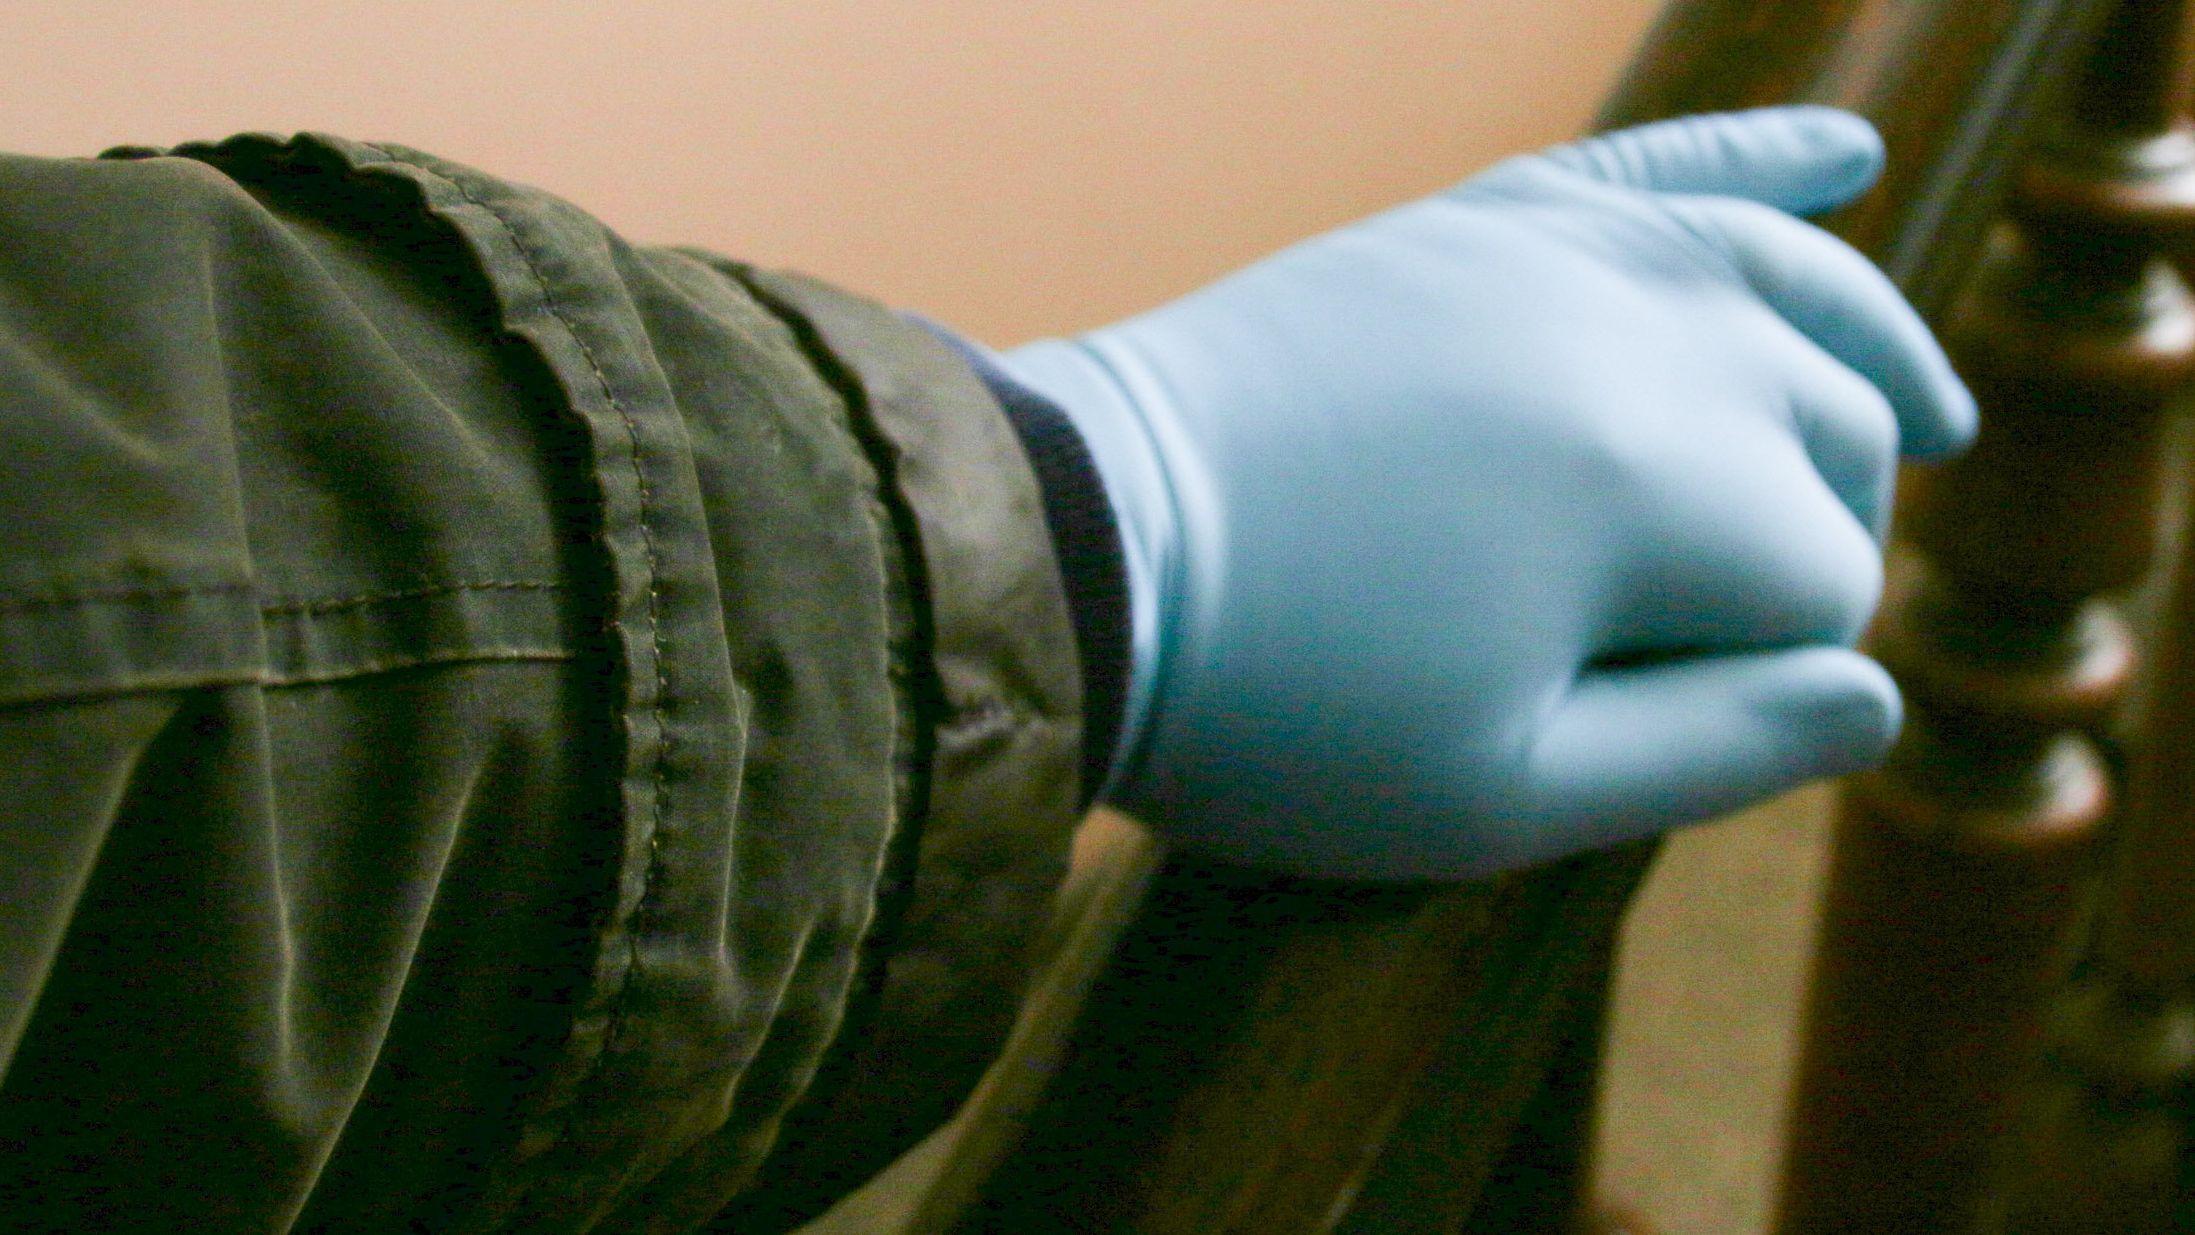 Handschuhe schützen vor Infektion